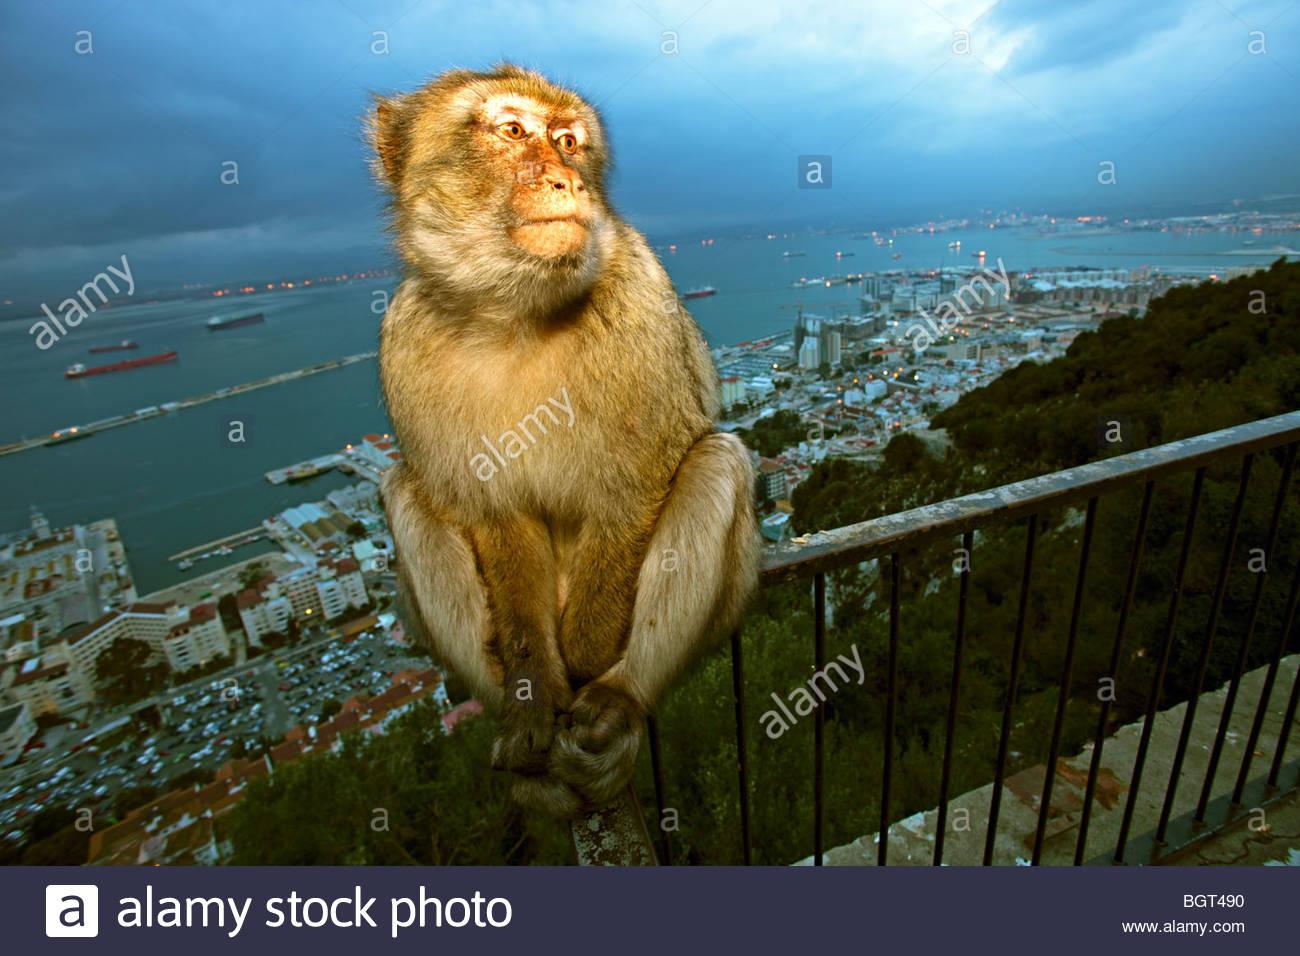 Gibraltar Ape (Macaca sylvanus), Rock of Gibraltar, UK - Stock Image